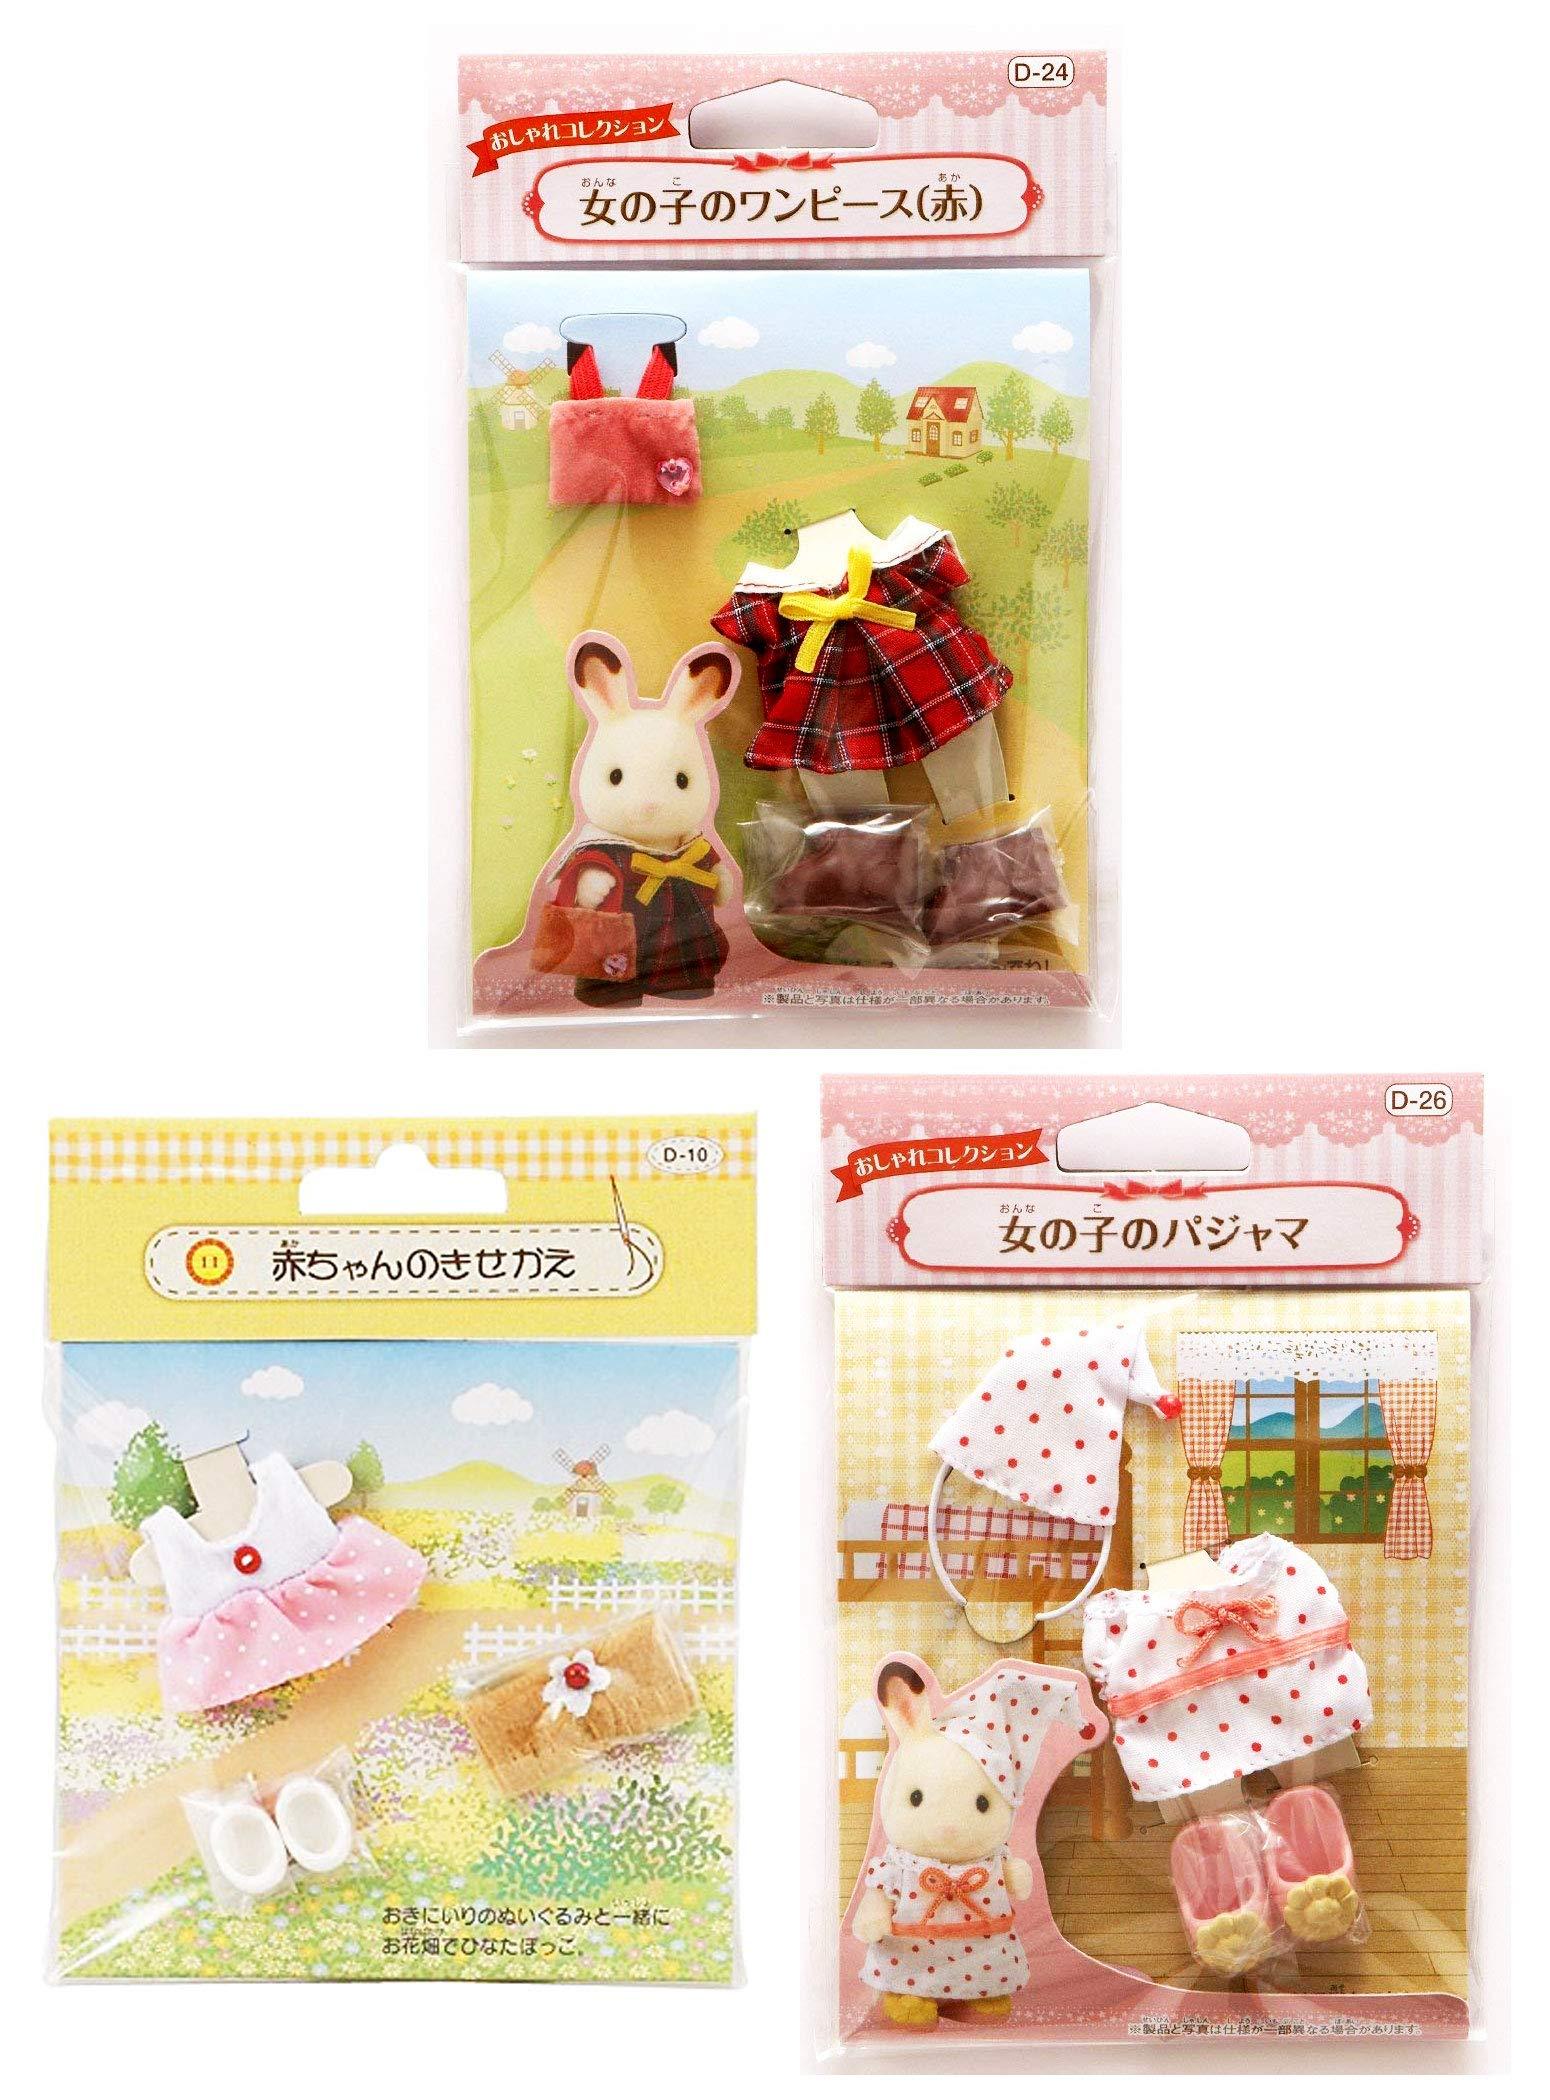 3 Clothing Sets - Girls Dress Up, Girl's Pajama and Girls Dress Sets (Japan Import)